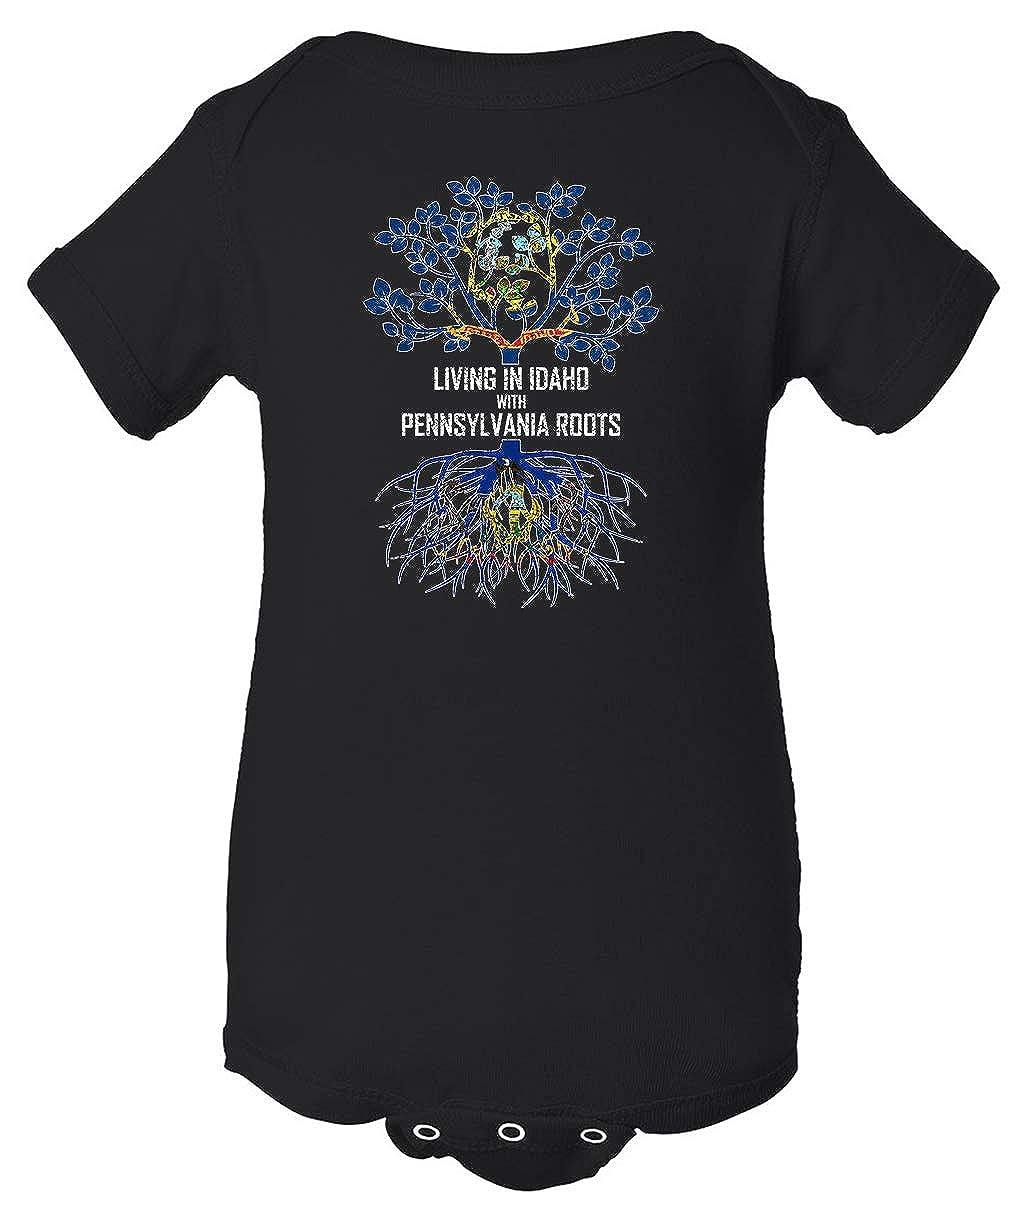 Tenacitee Babys Living in Idaho Pennsylvania Roots Shirt